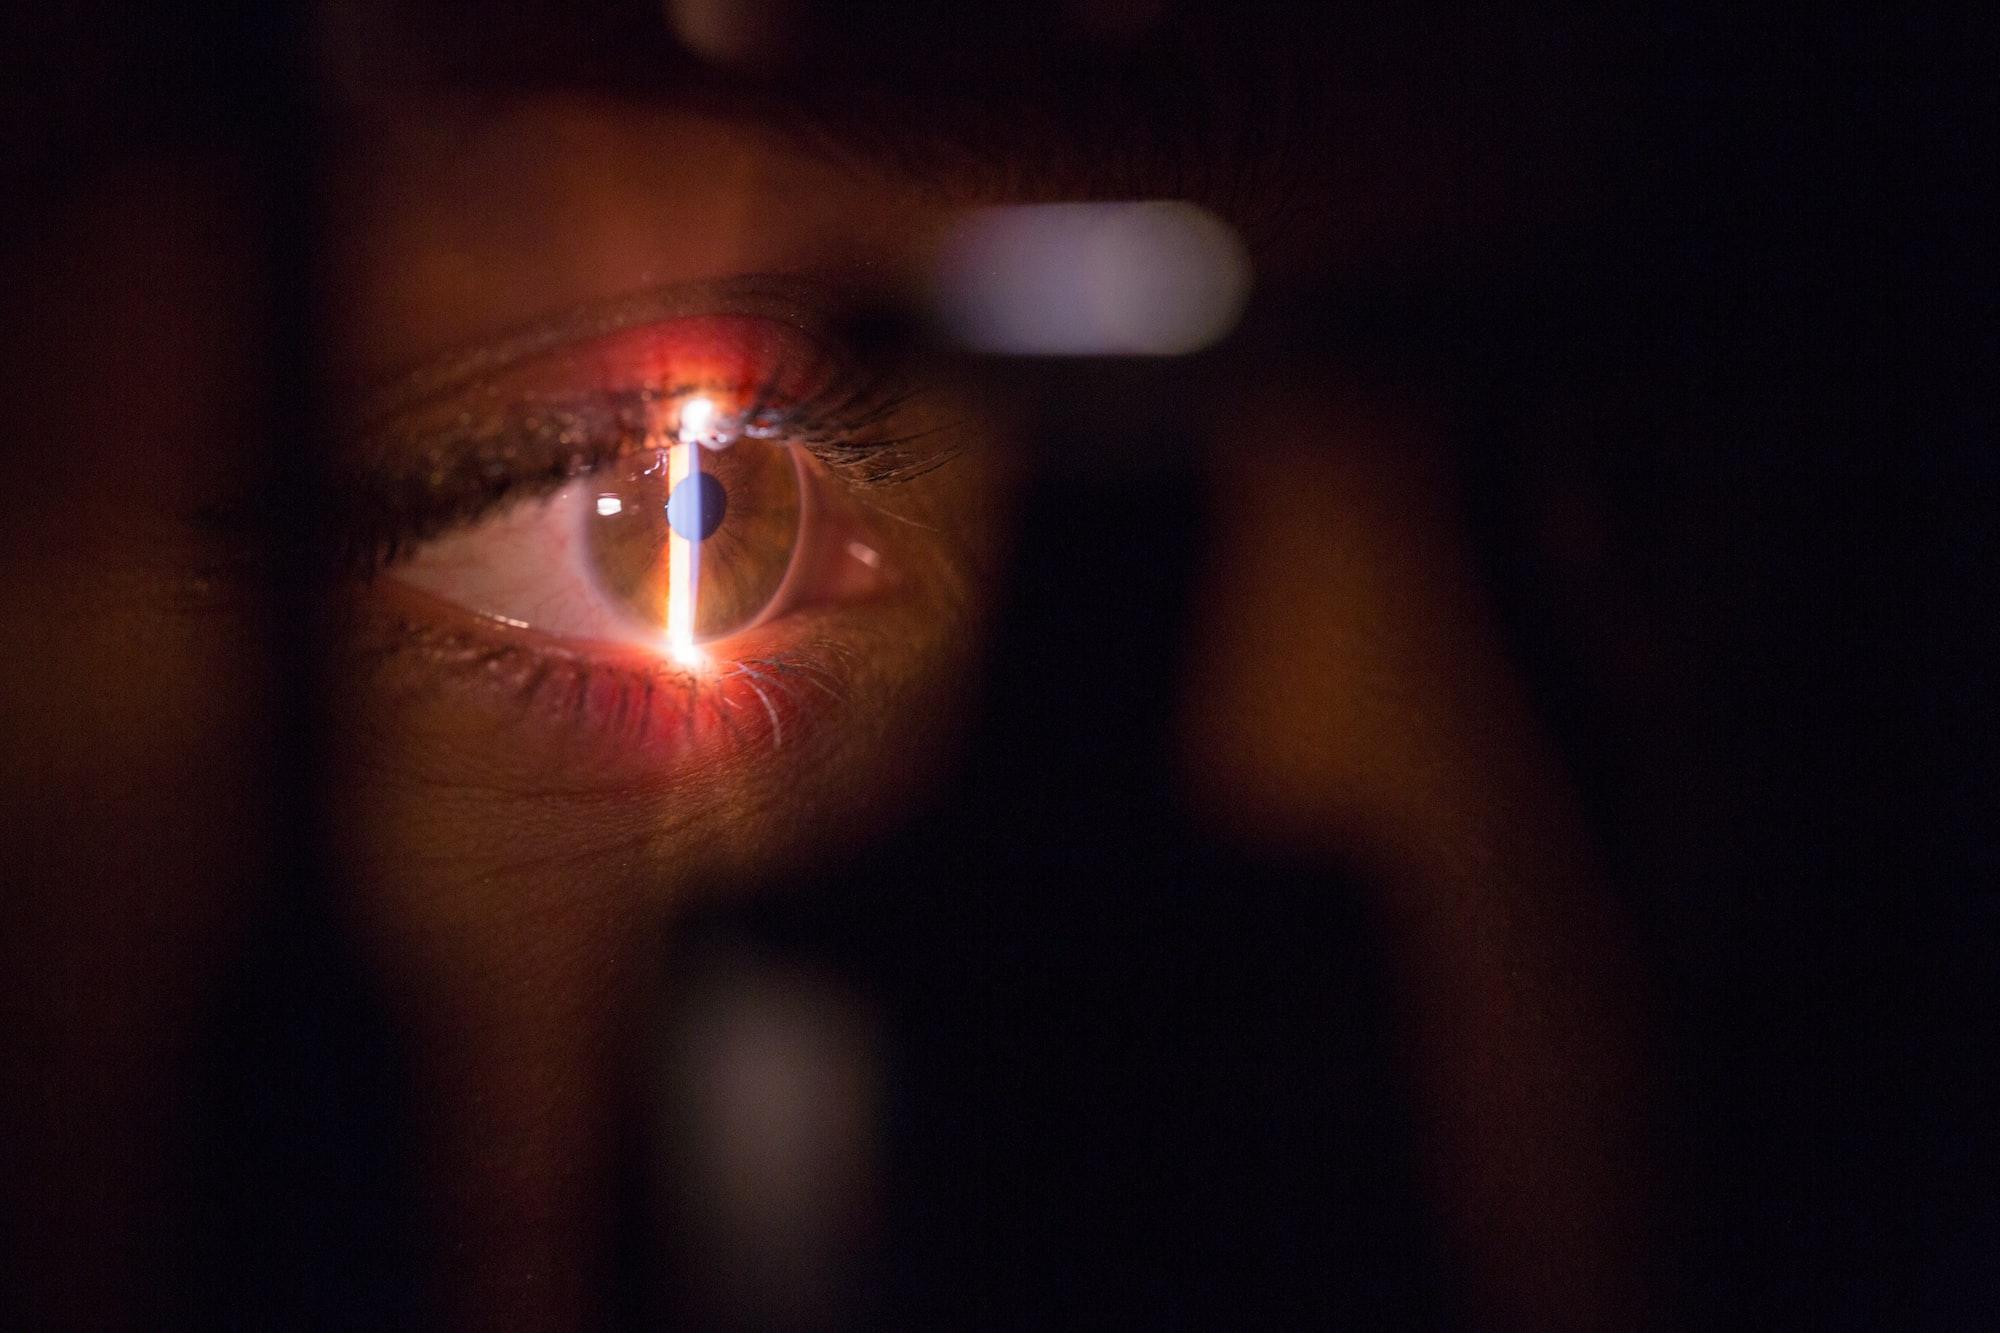 Eye doctor laser scan surgery machine